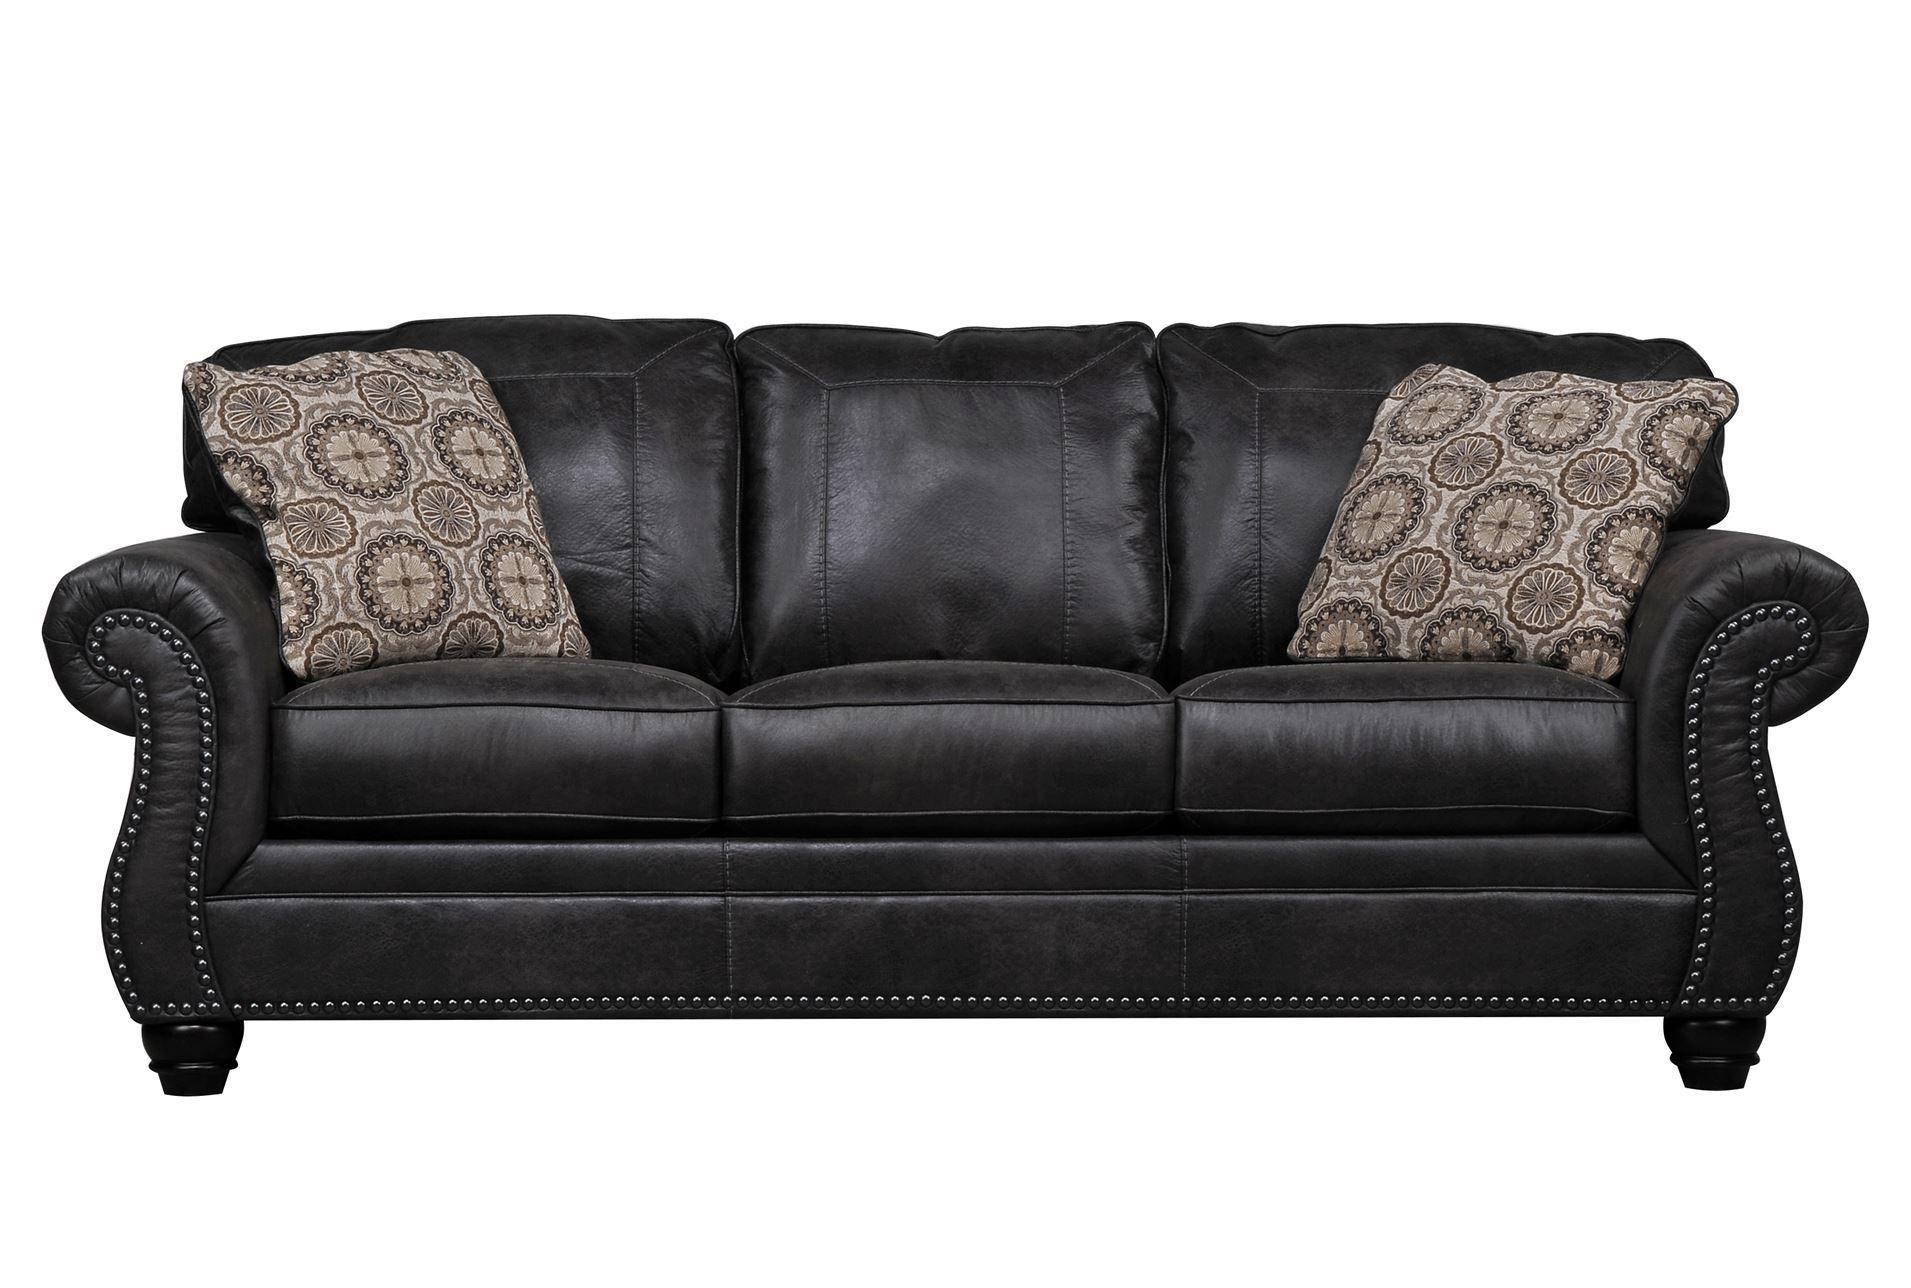 Best Breville Charcoal Sofa Charcoal Sofa Fabric Sofa Sofa 400 x 300